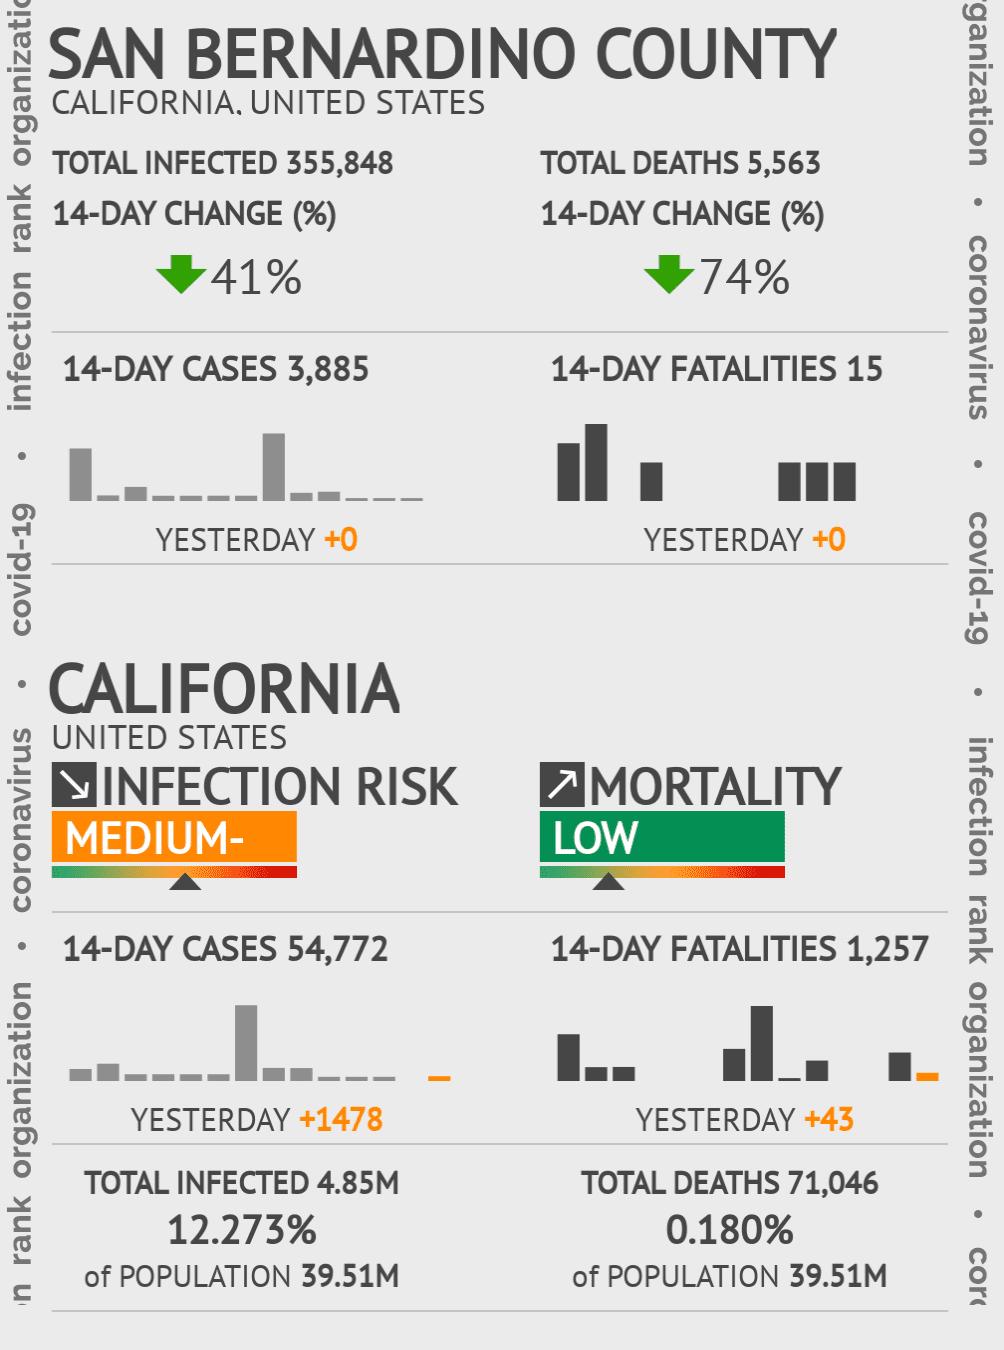 San Bernardino County Coronavirus Covid-19 Risk of Infection on November 30, 2020